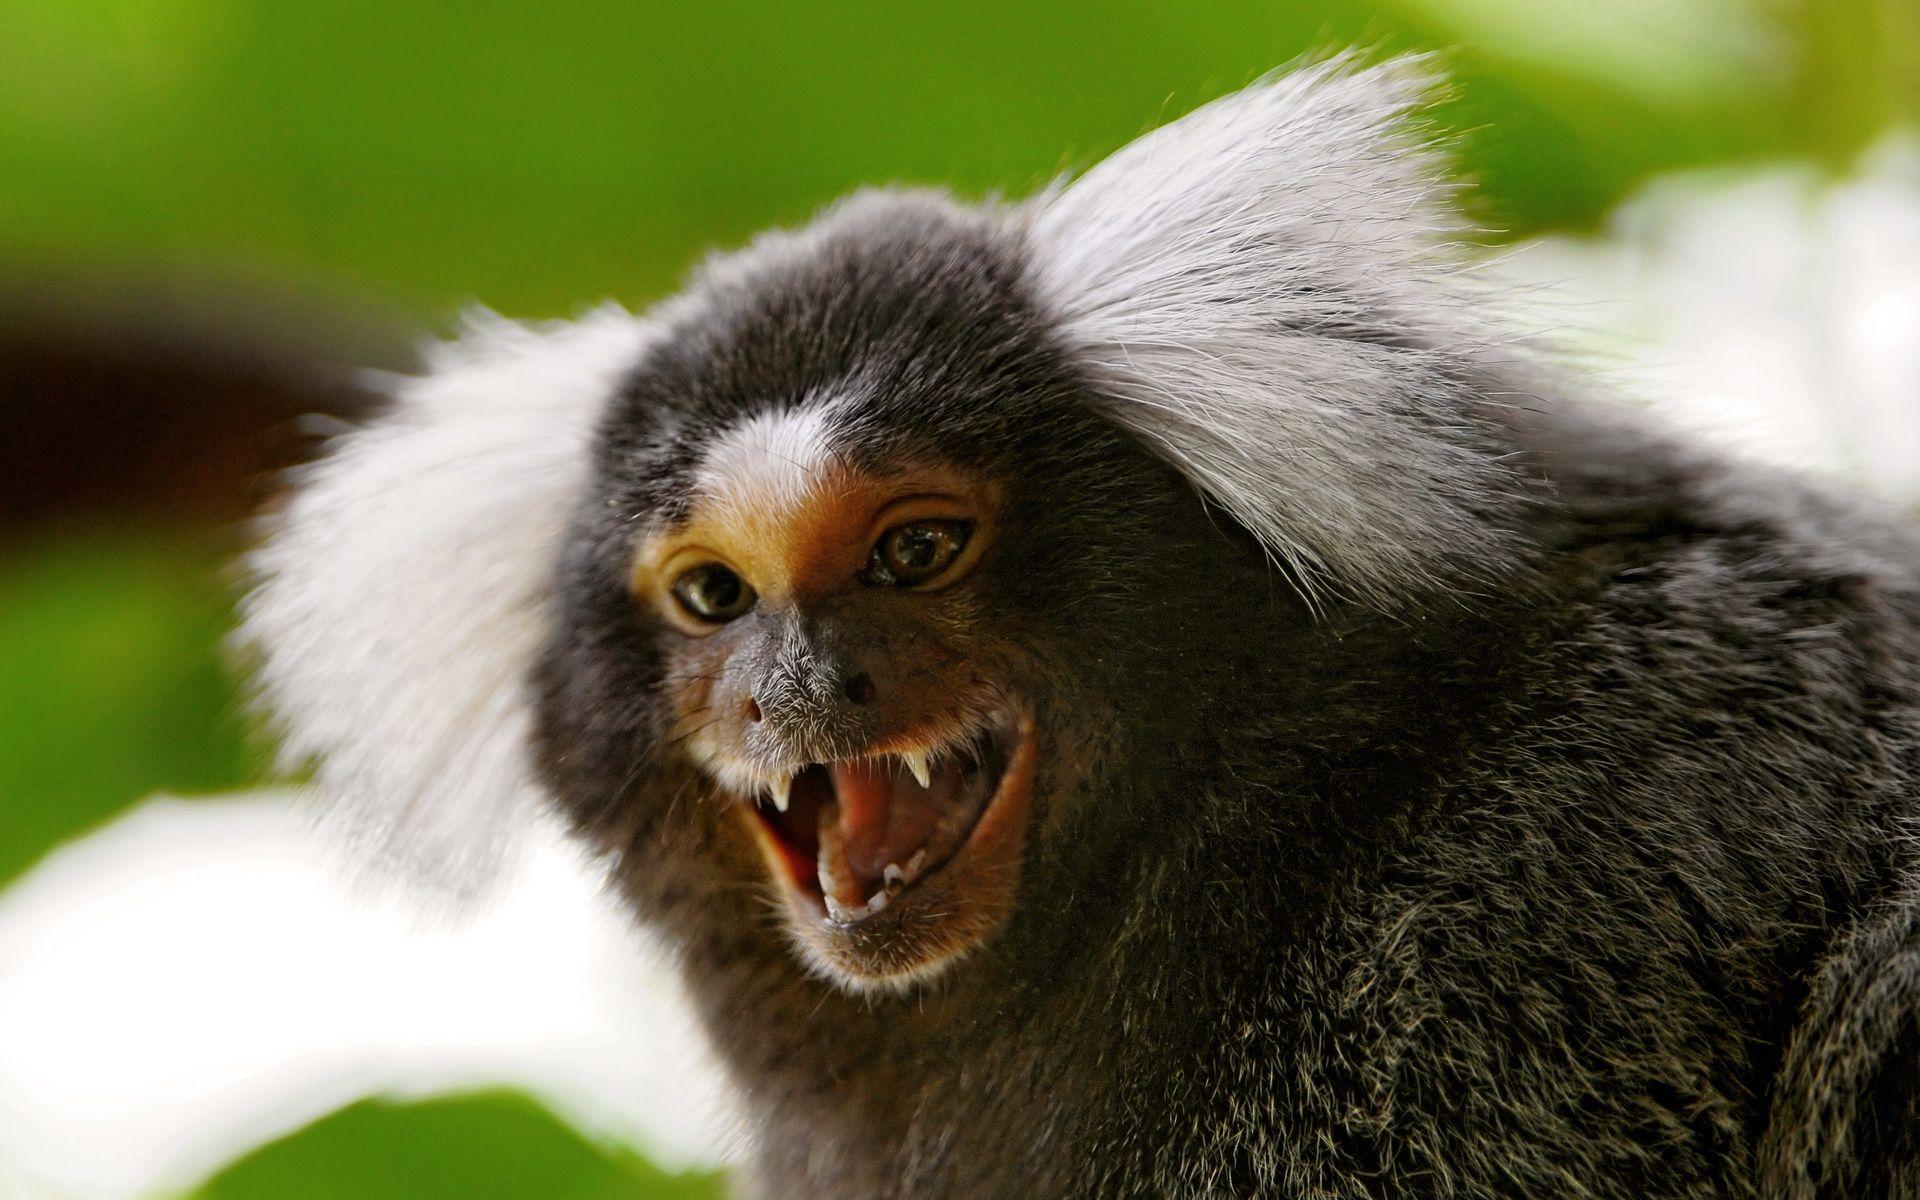 Marmosets With Attitude | Marmoset monkey, Monkey wallpaper, Monkey pictures